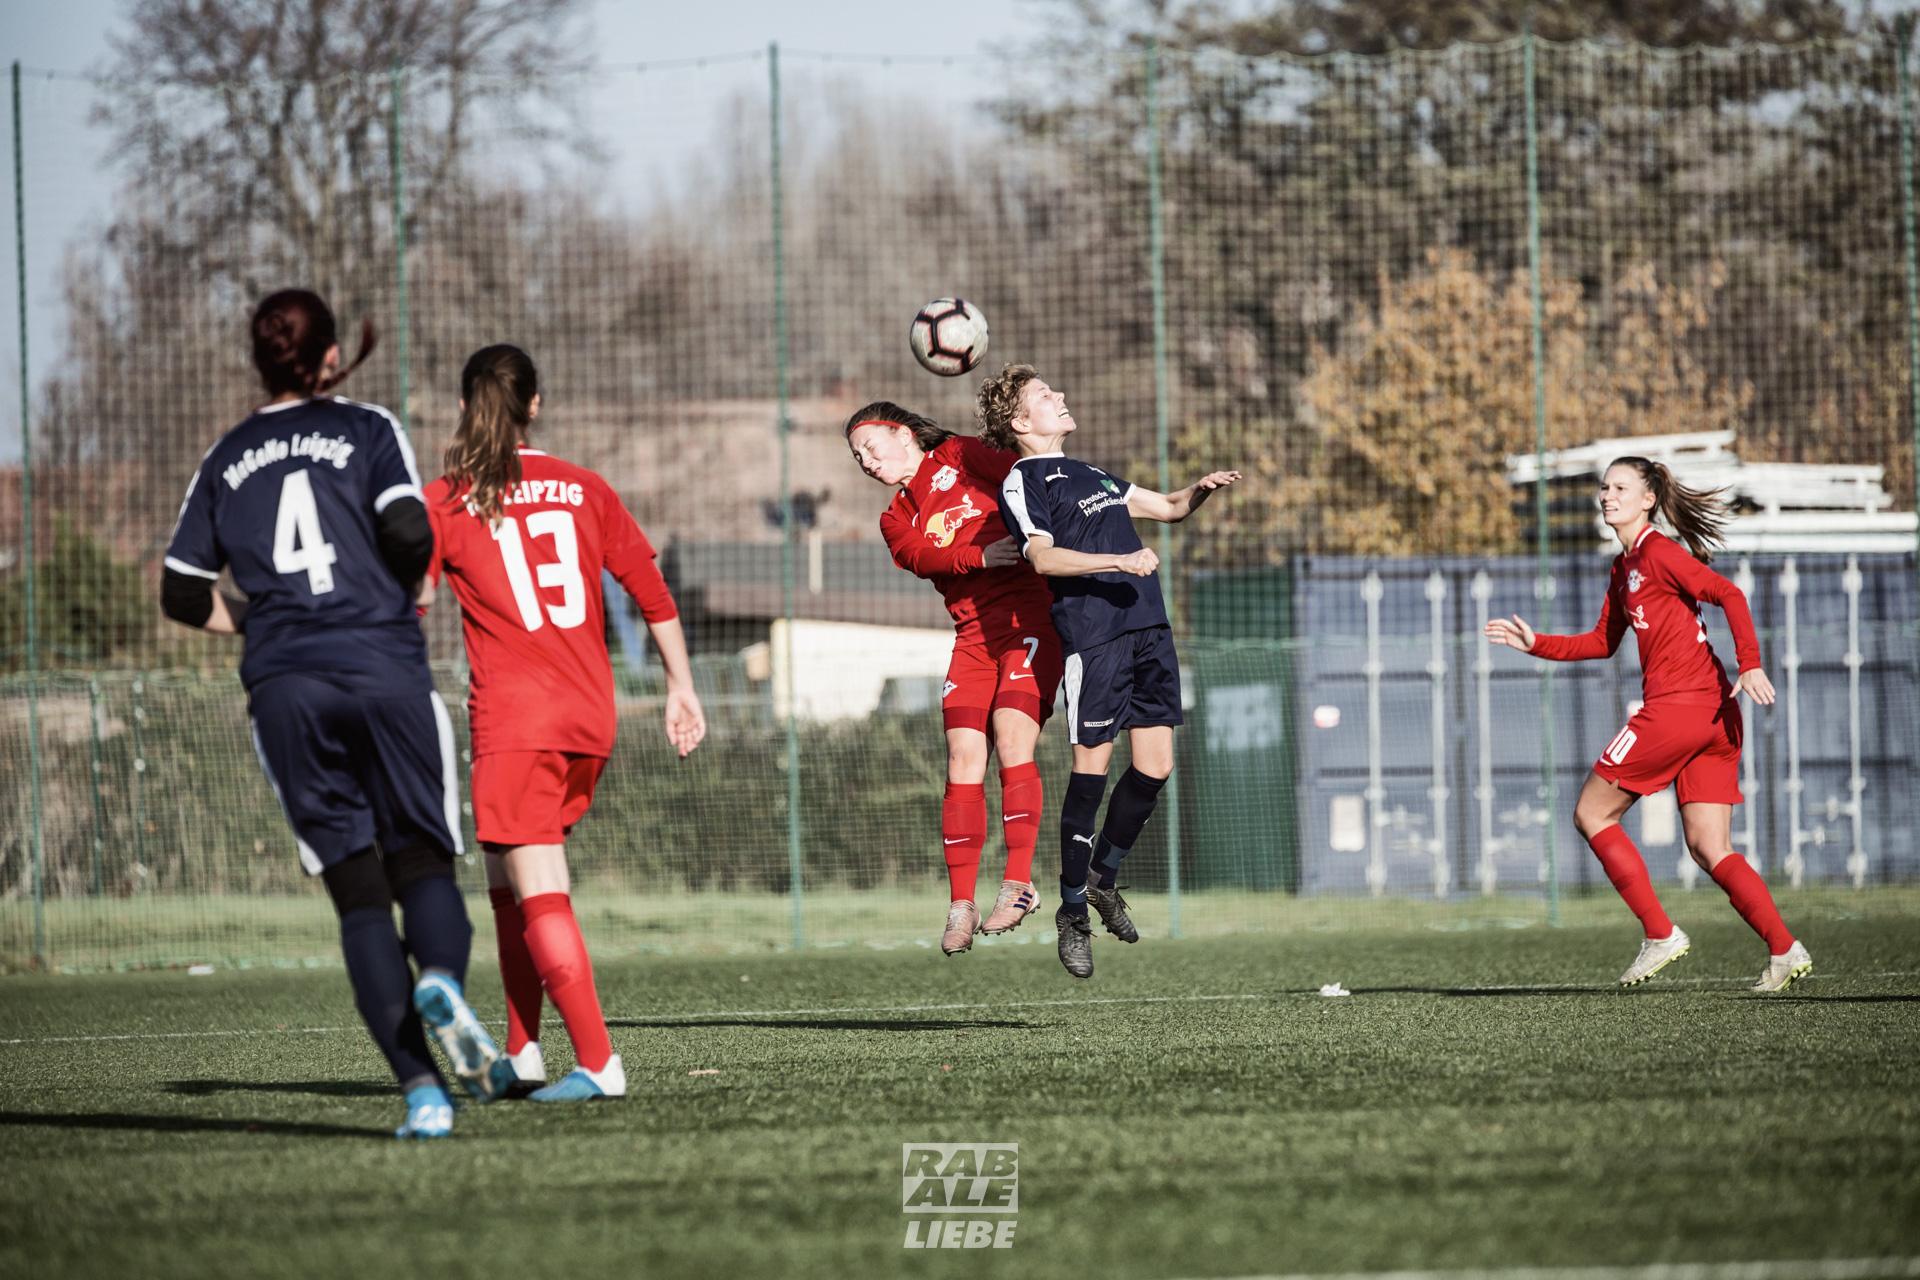 Landesliga Frauen: RB Leipzig II -vs- Motor Gohlis-Nord